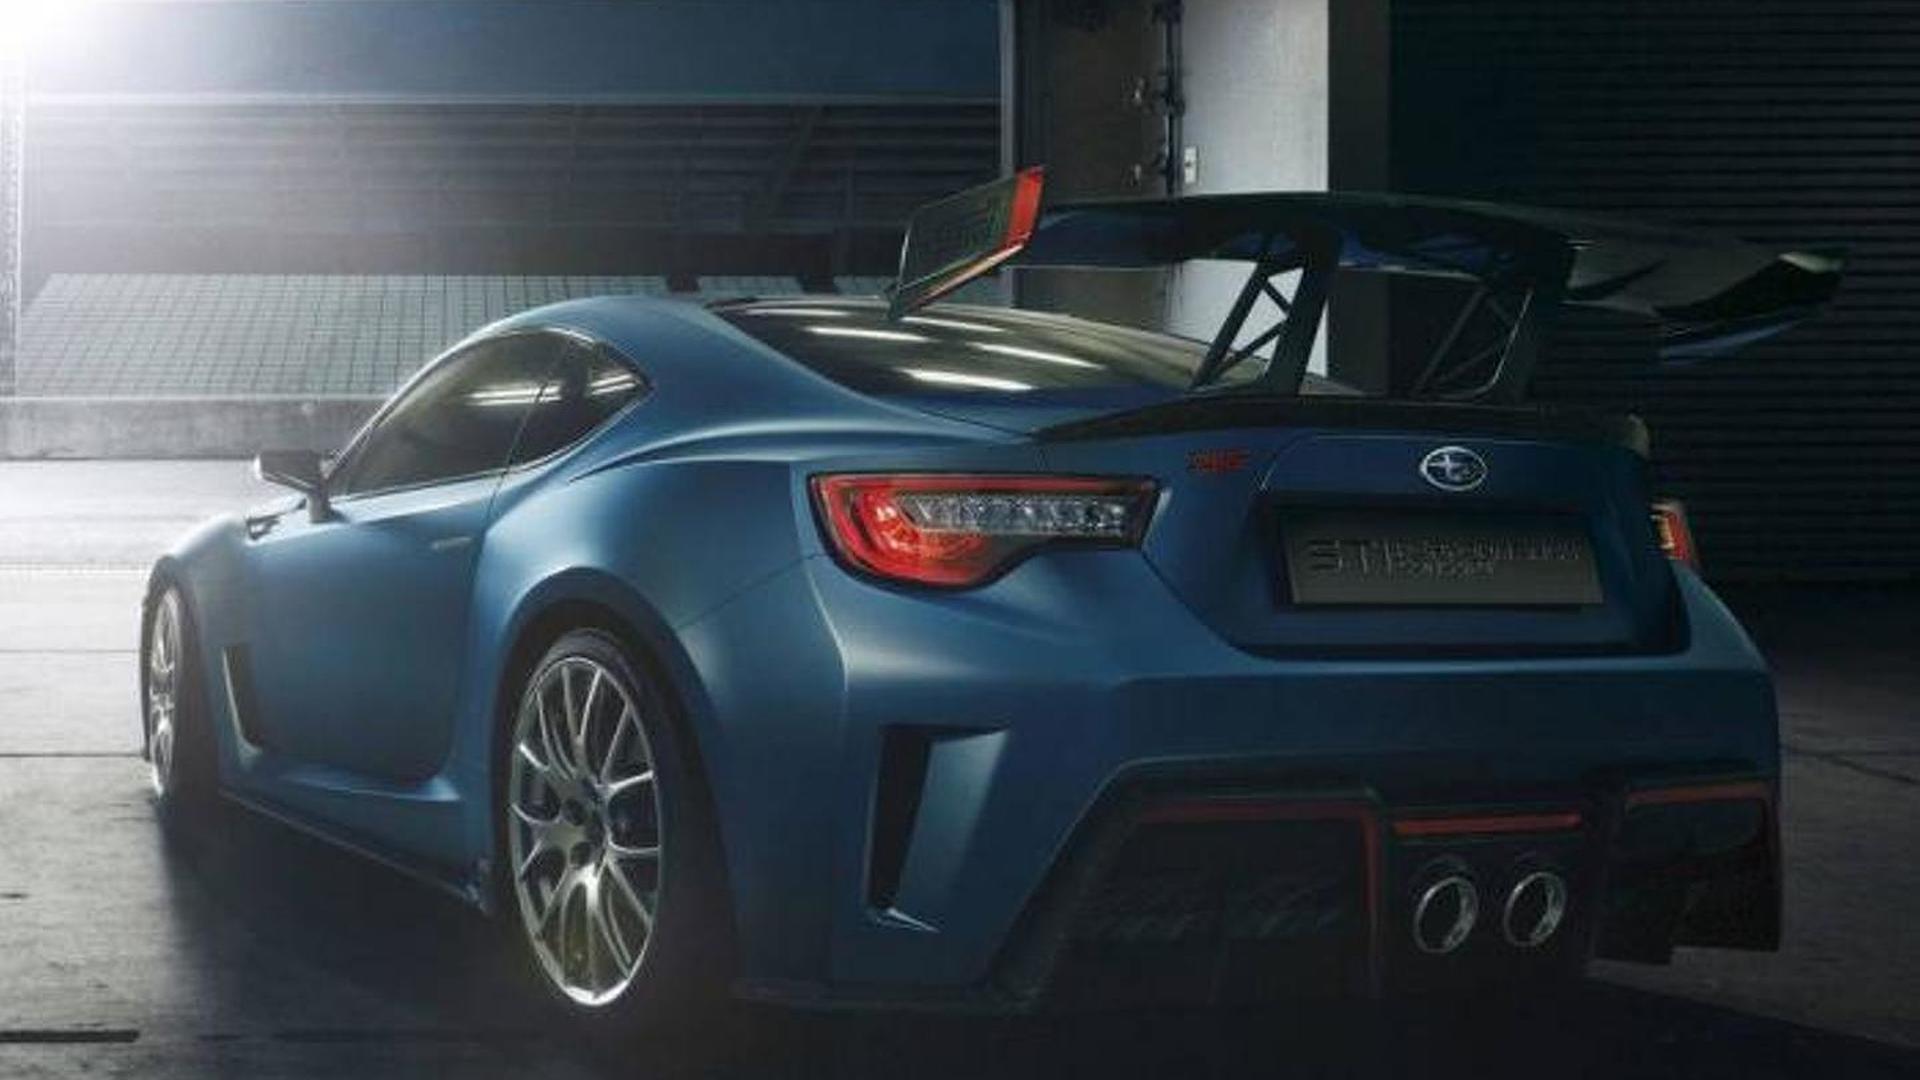 「Subaru BRZ next gen」の画像検索結果